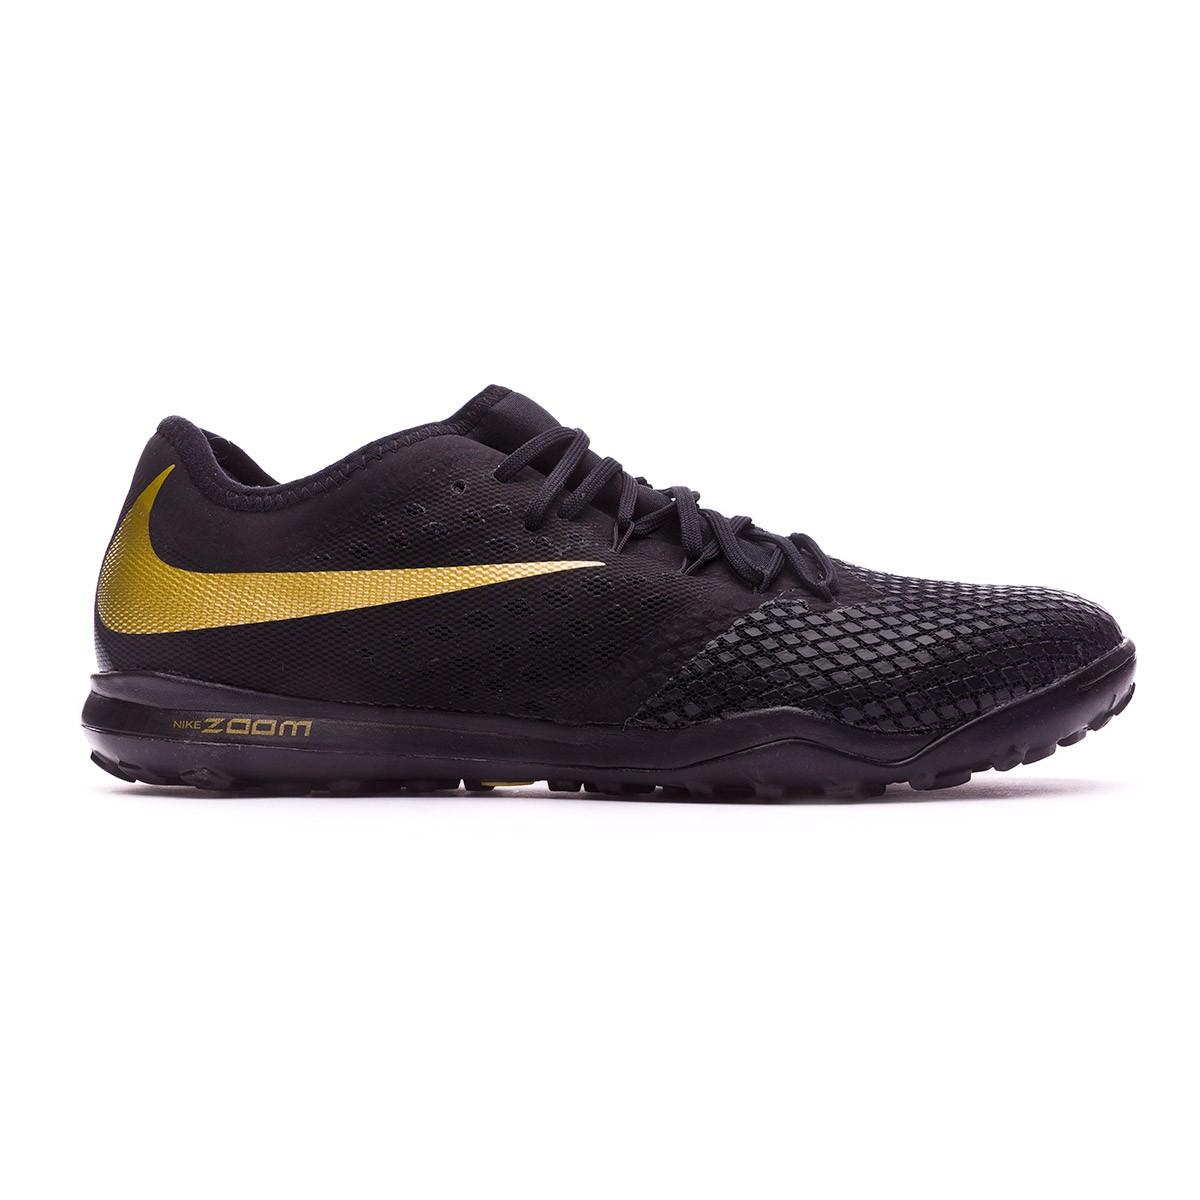 779aa7a94 ... Zapatilla Hypervenom Zoom PhantomX III Pro Turf Black-Metallic vivid  gold. CATEGORY. Football Boots · Nike